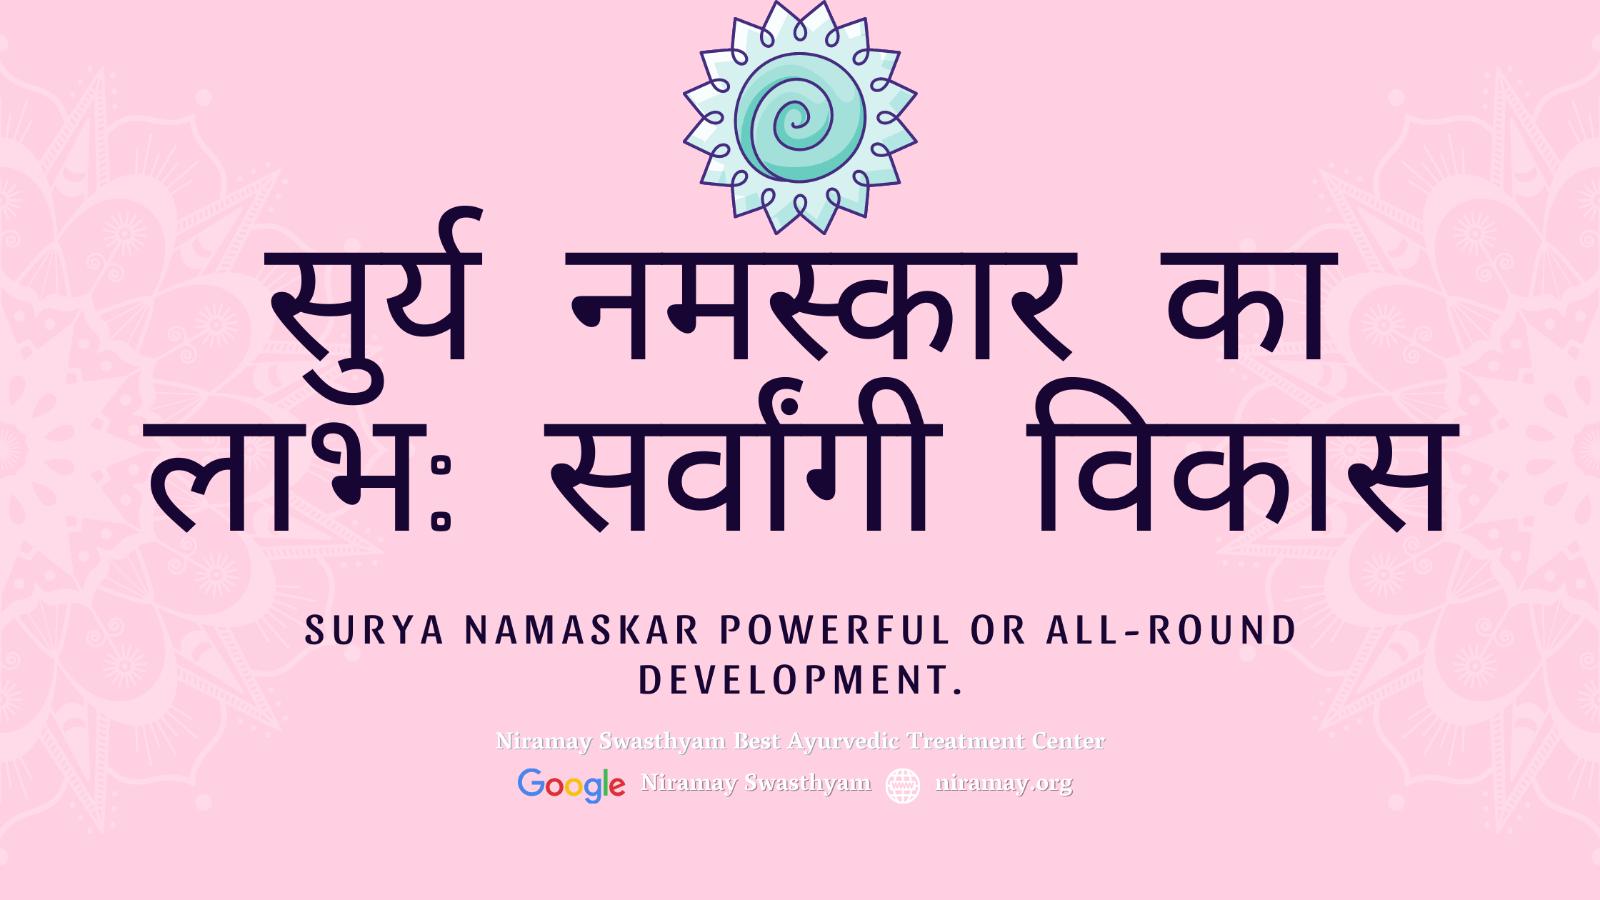 32 सुर्य नमस्कार का लाभ: सर्वांगी विकास Surya Namaskar Powerful or All-round development.